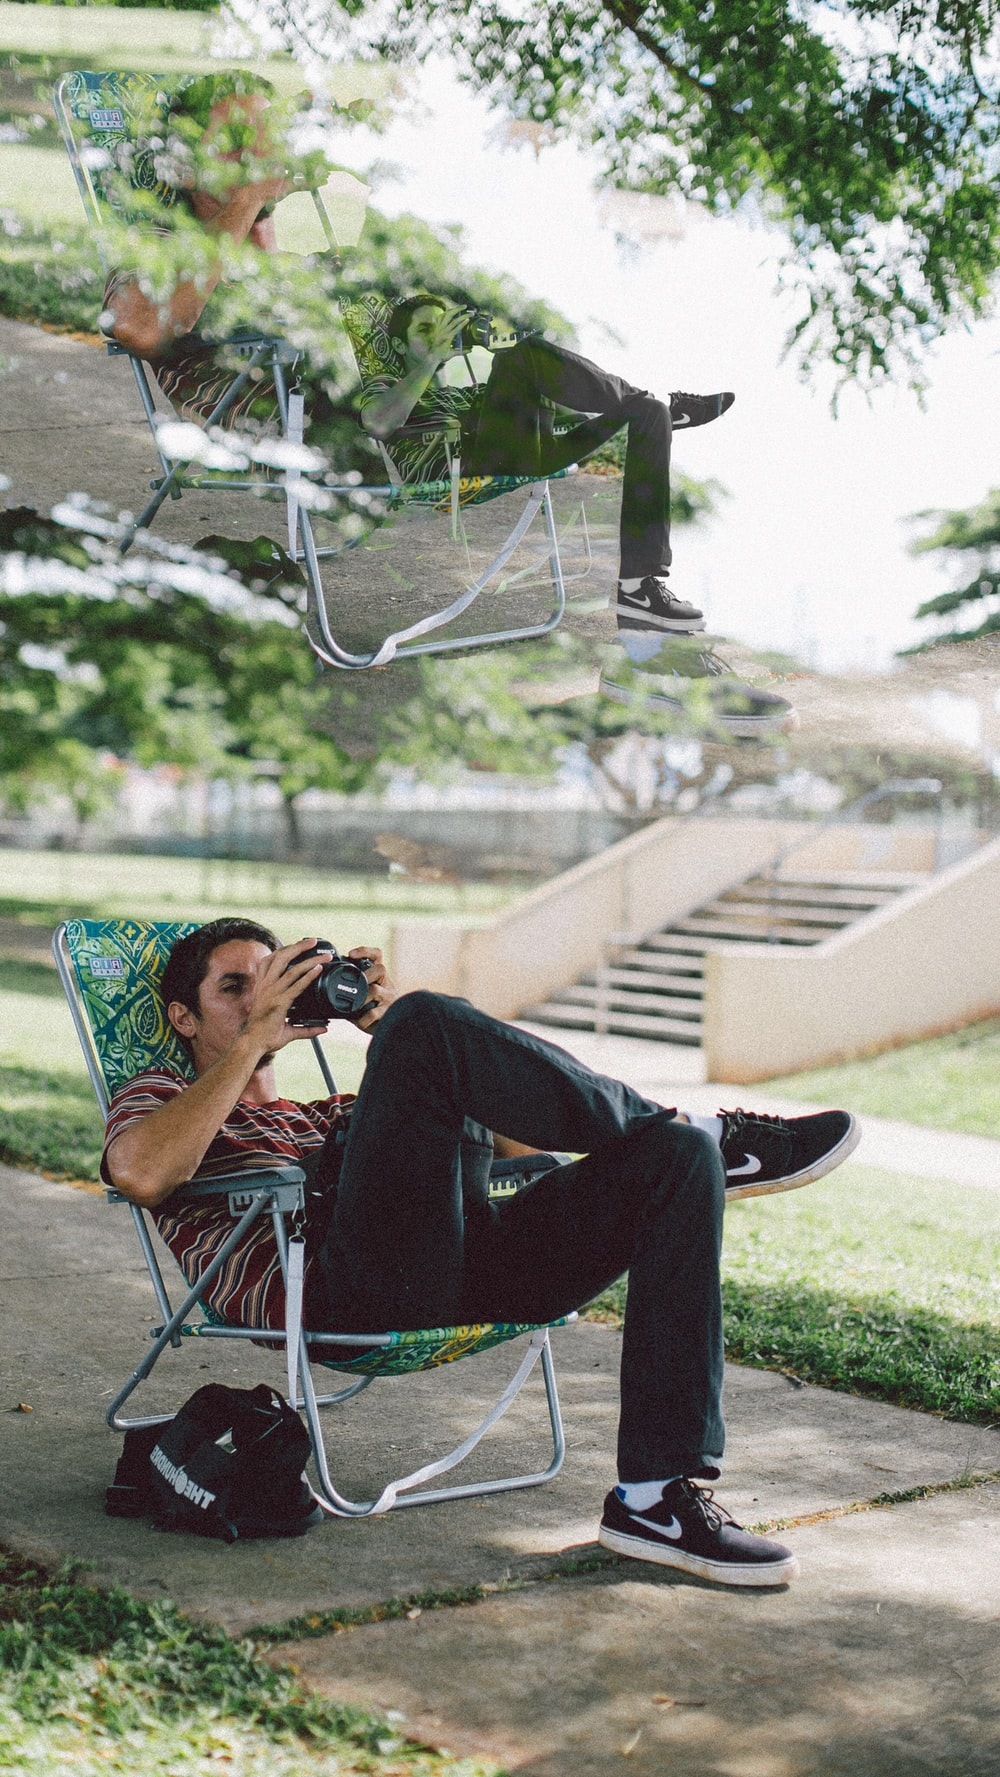 man sitting on folding chair using DSLR camera